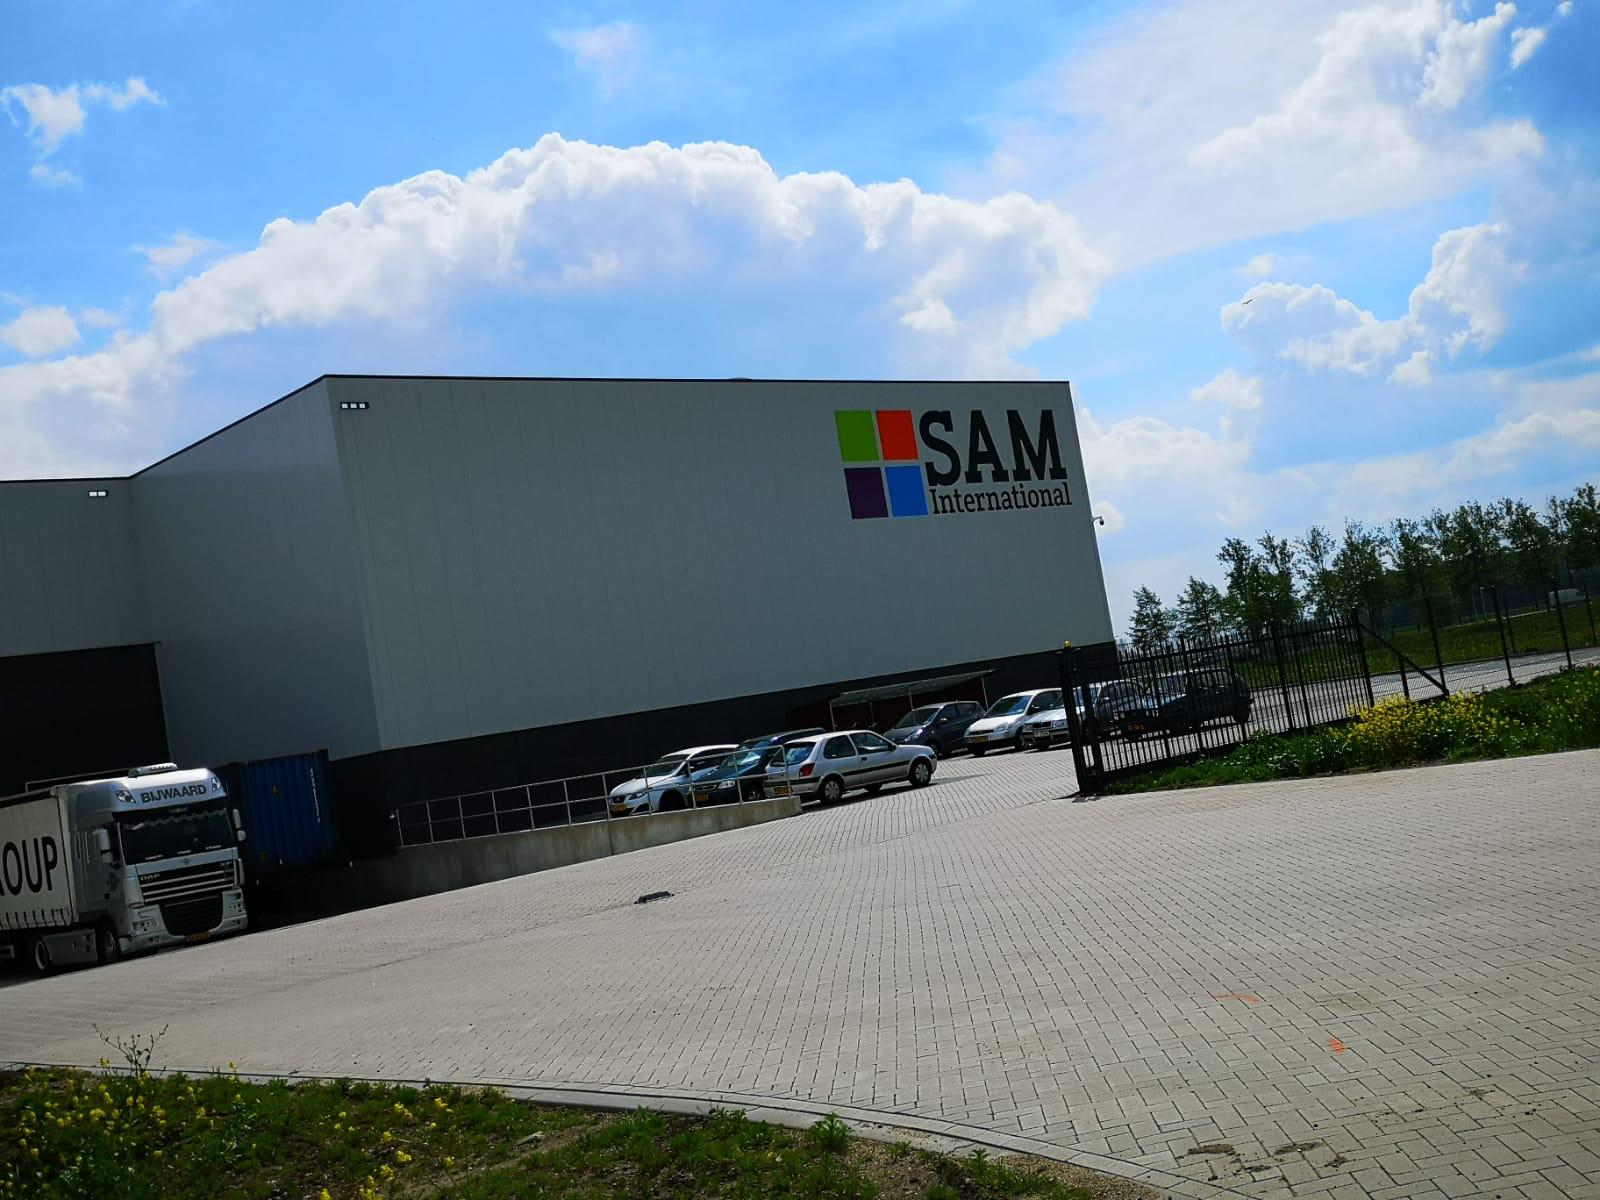 SAM international